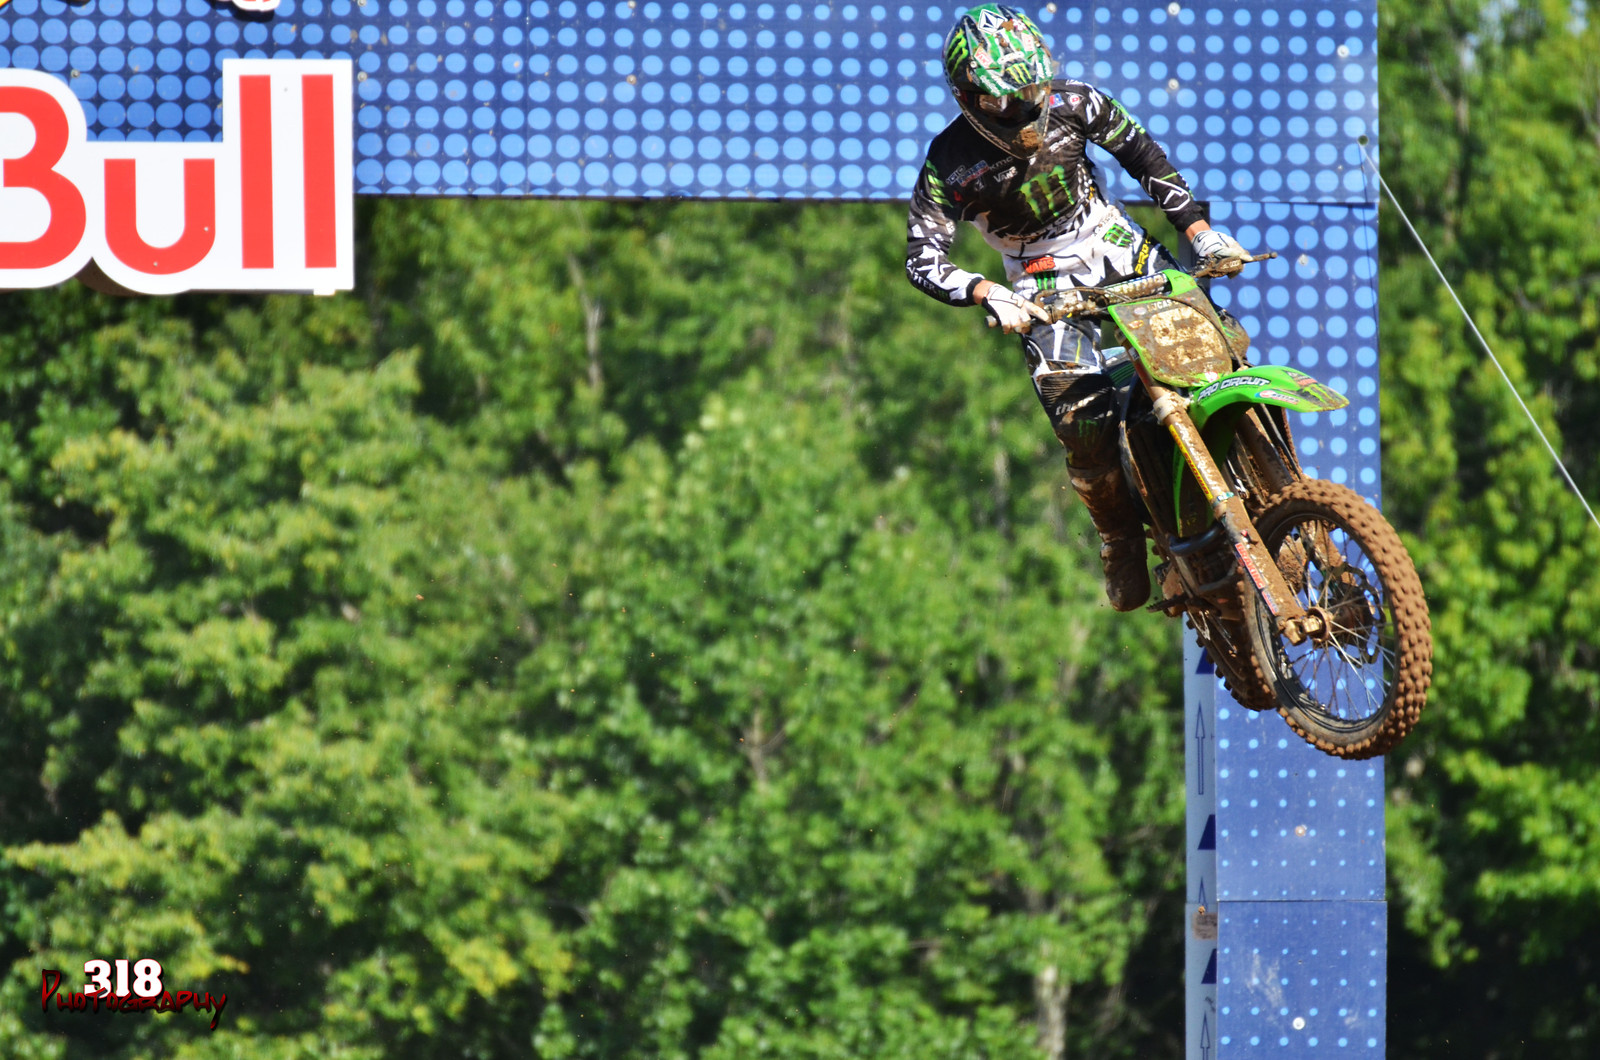 9-01 - MxPro318 - Motocross Pictures - Vital MX